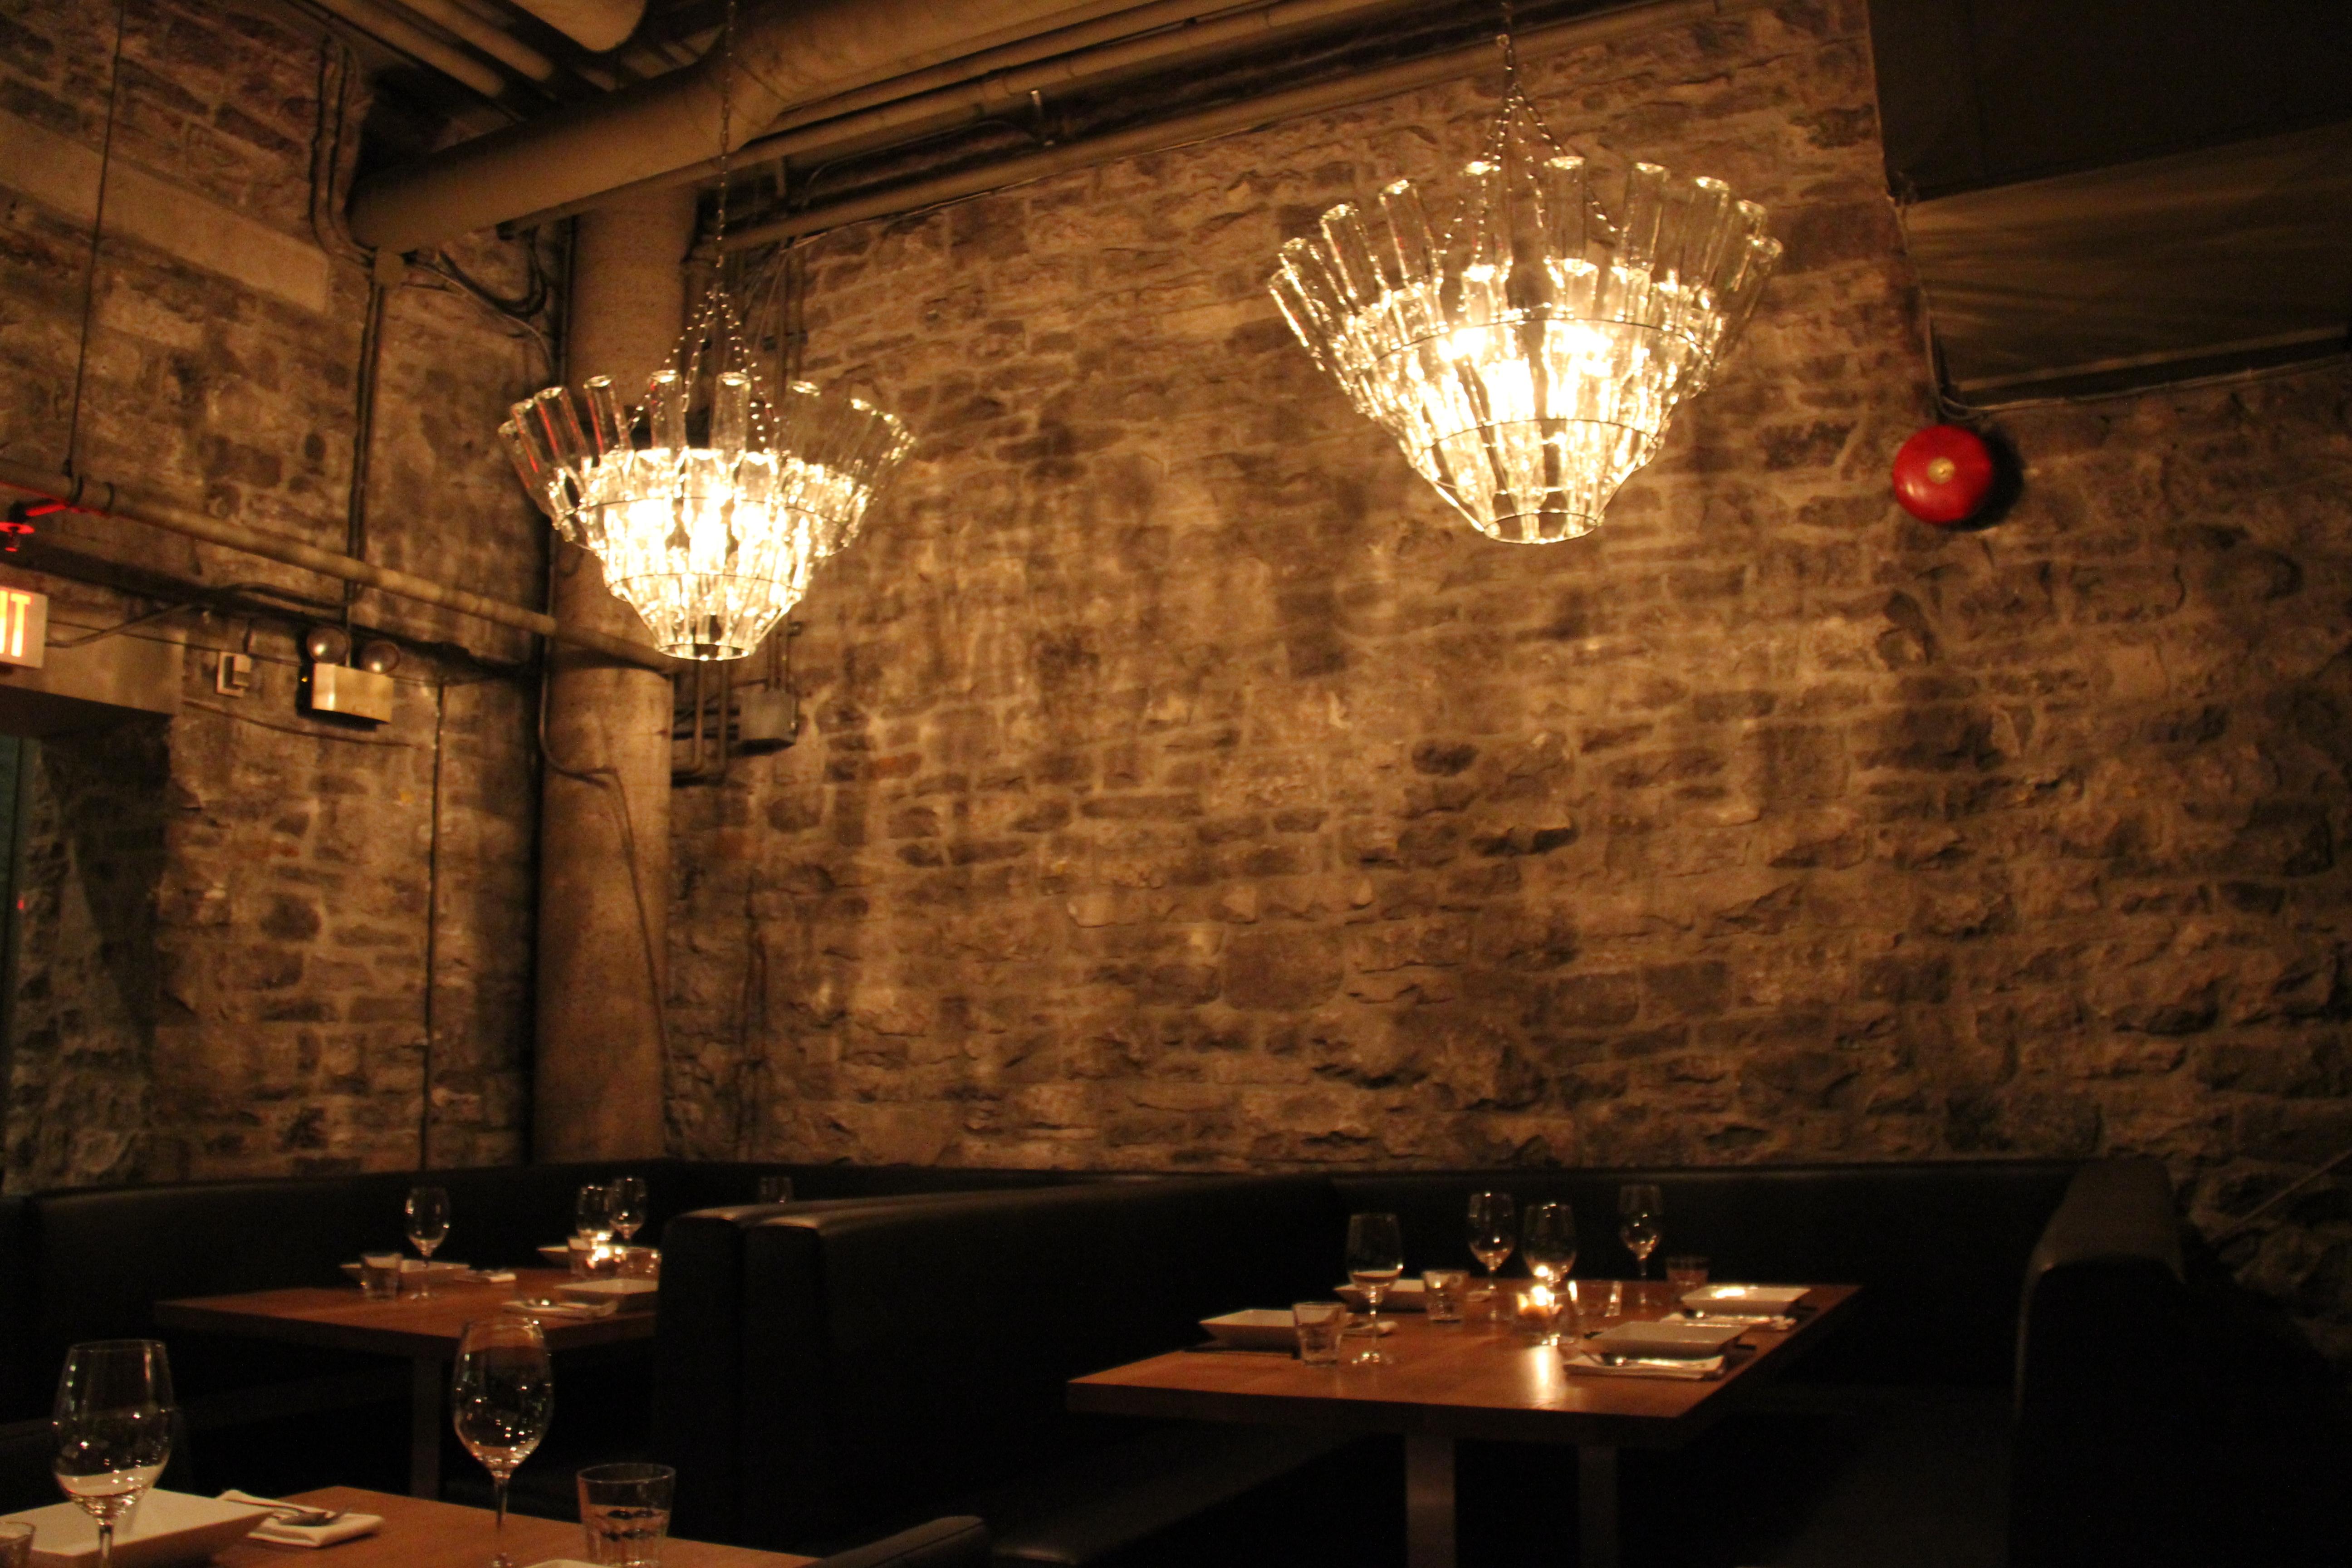 12 best collection of restaurant chandelier sidedoor contemporary restaurant gastronomic ottawa intended for restaurant chandelier 12 of 12 arubaitofo Choice Image